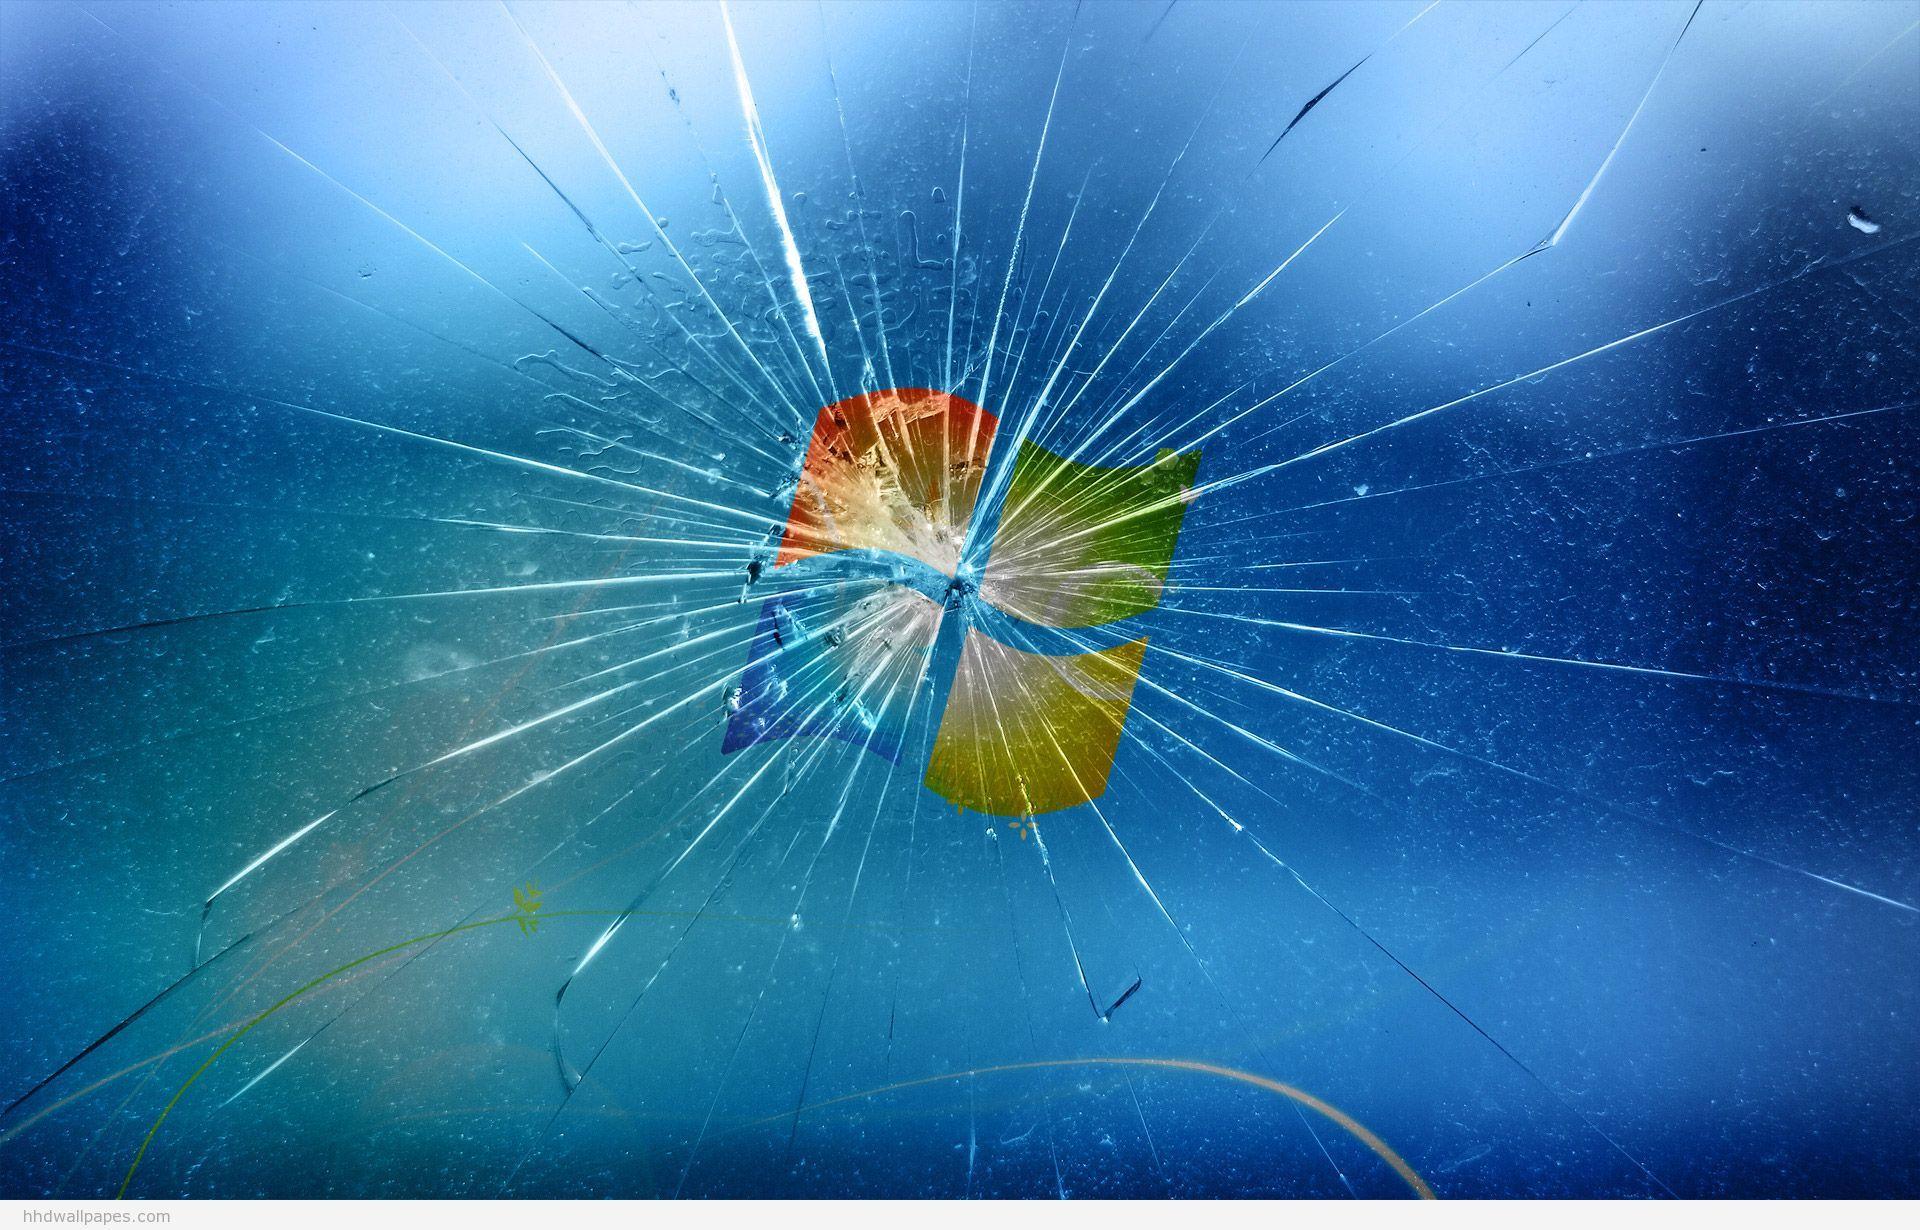 Must see Wallpaper High Quality Windows 7 - fd172e58761989580f718766e42bcafa  Pictures_347181.jpg